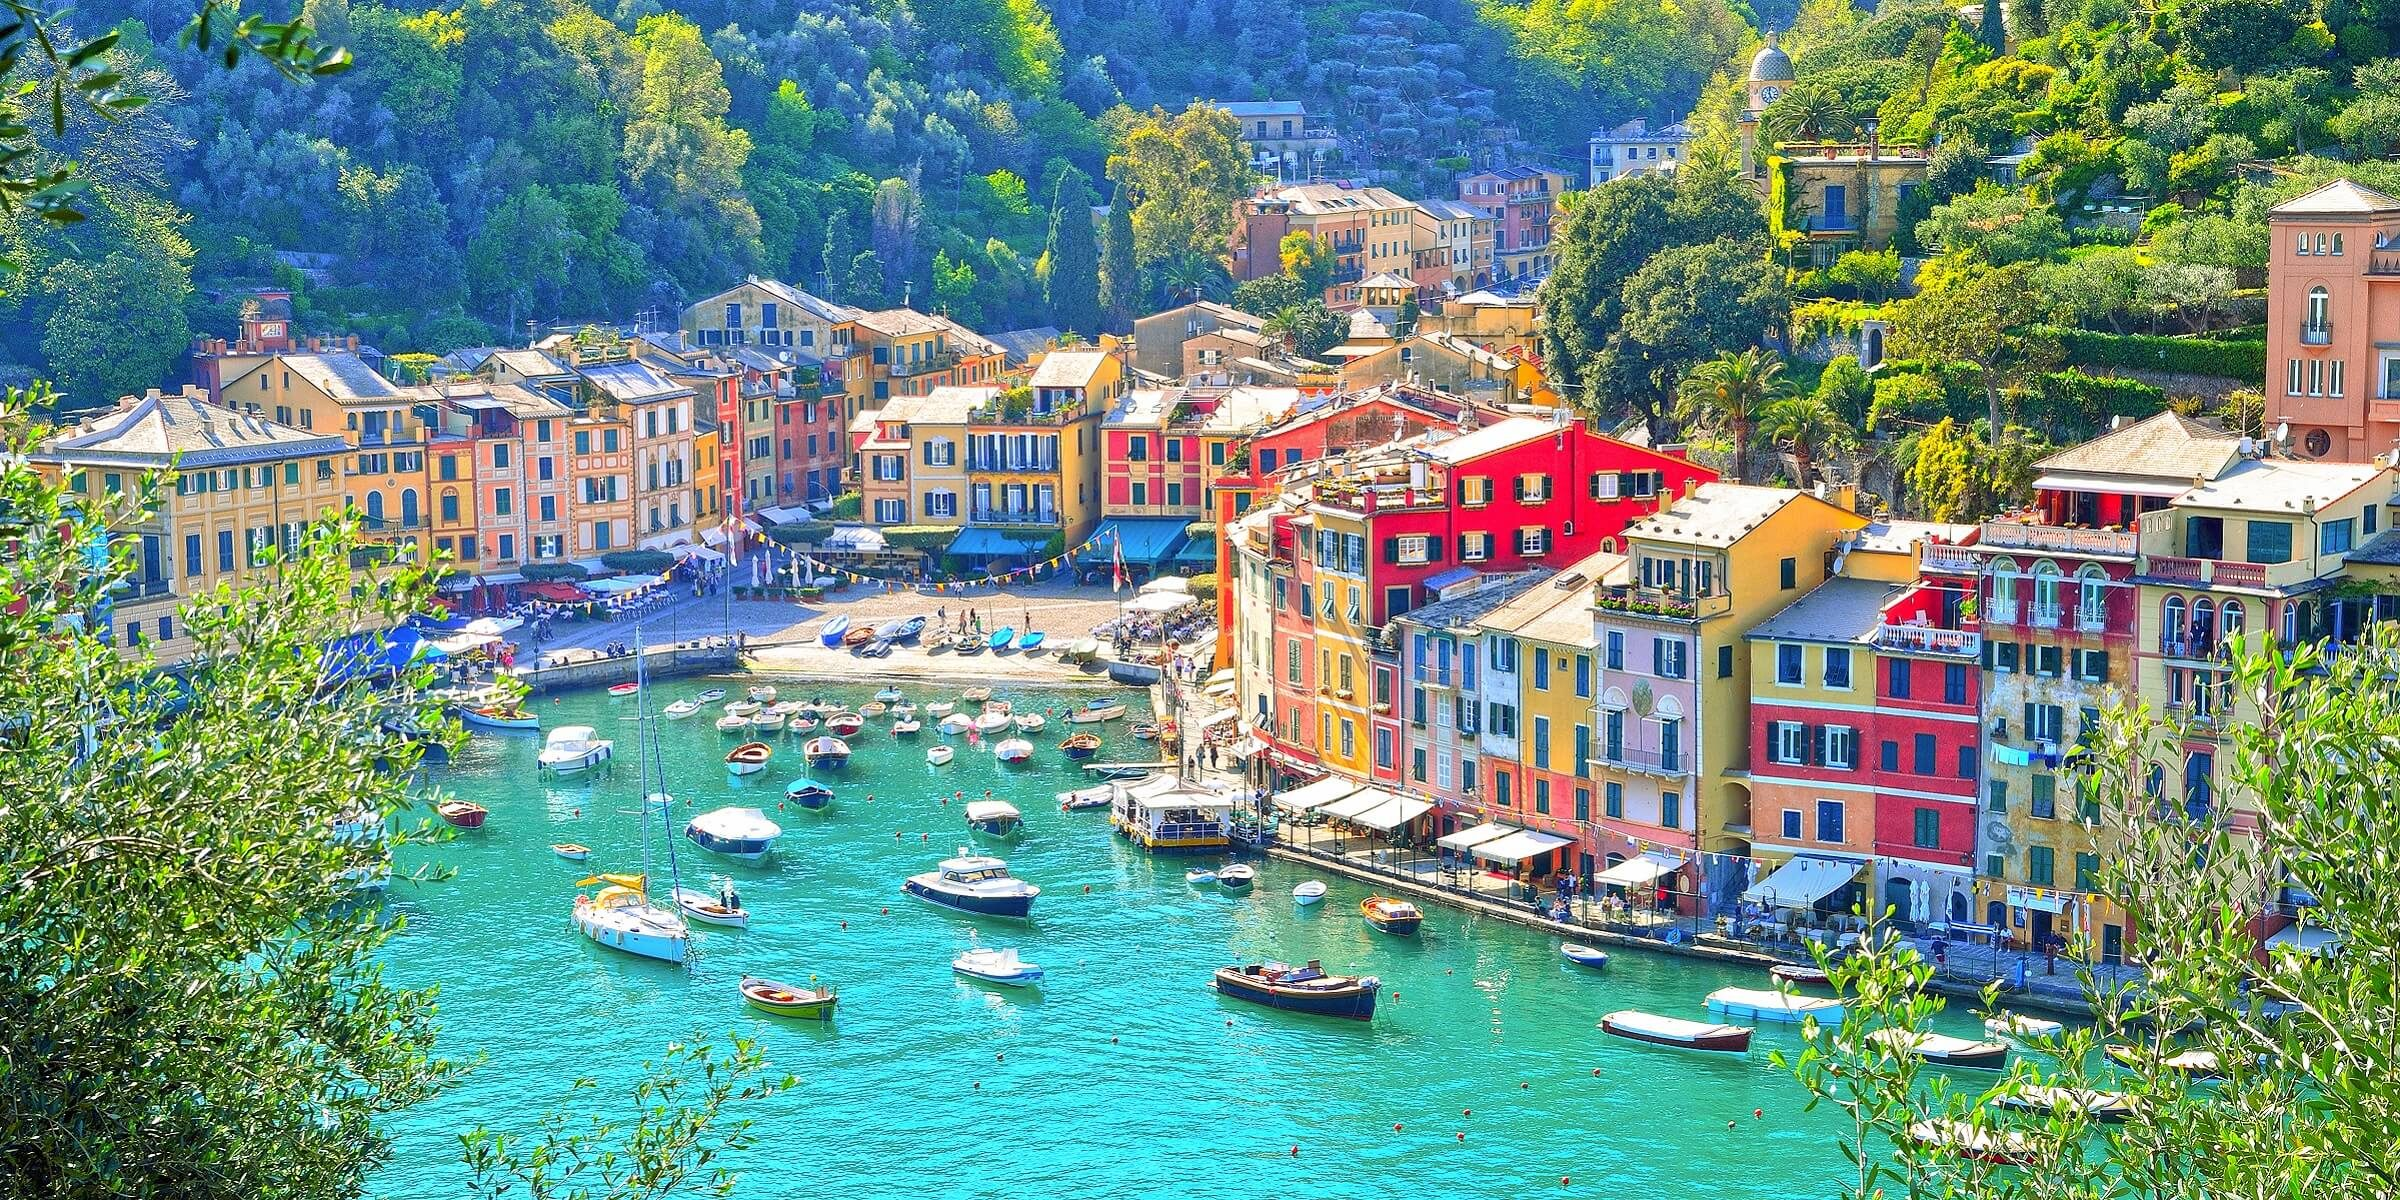 Pastellfarbene Häuser in Portofino